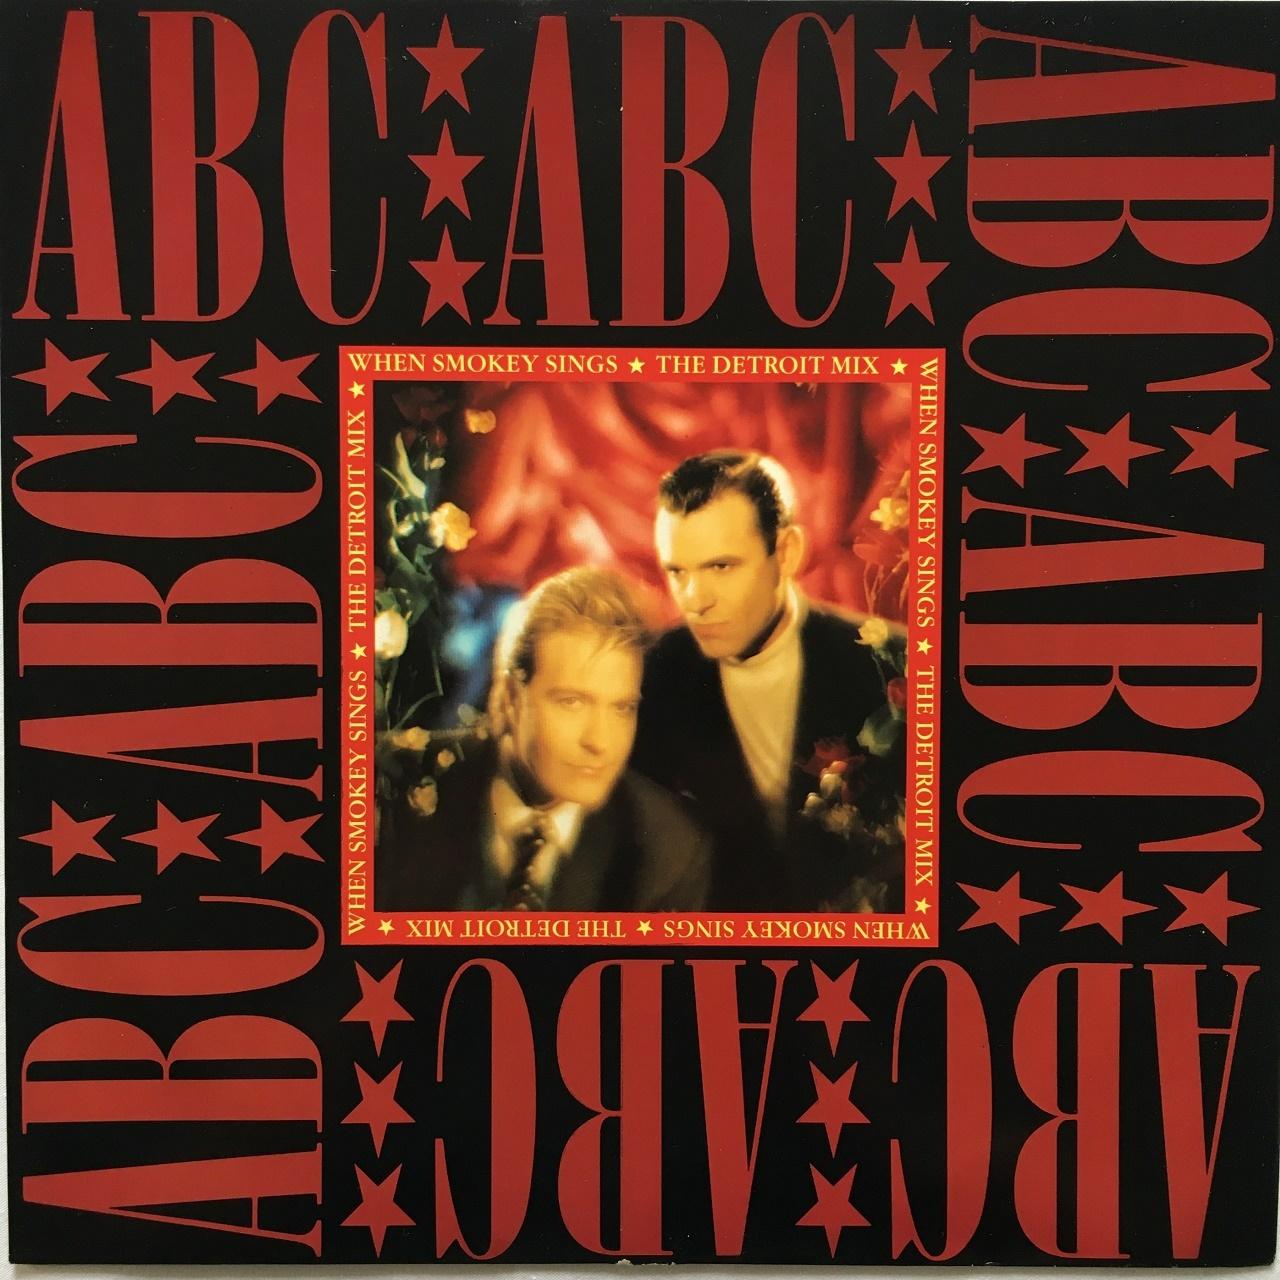 【12inch・英盤】ABC / When Smokey Sings (The Detroit Mix)